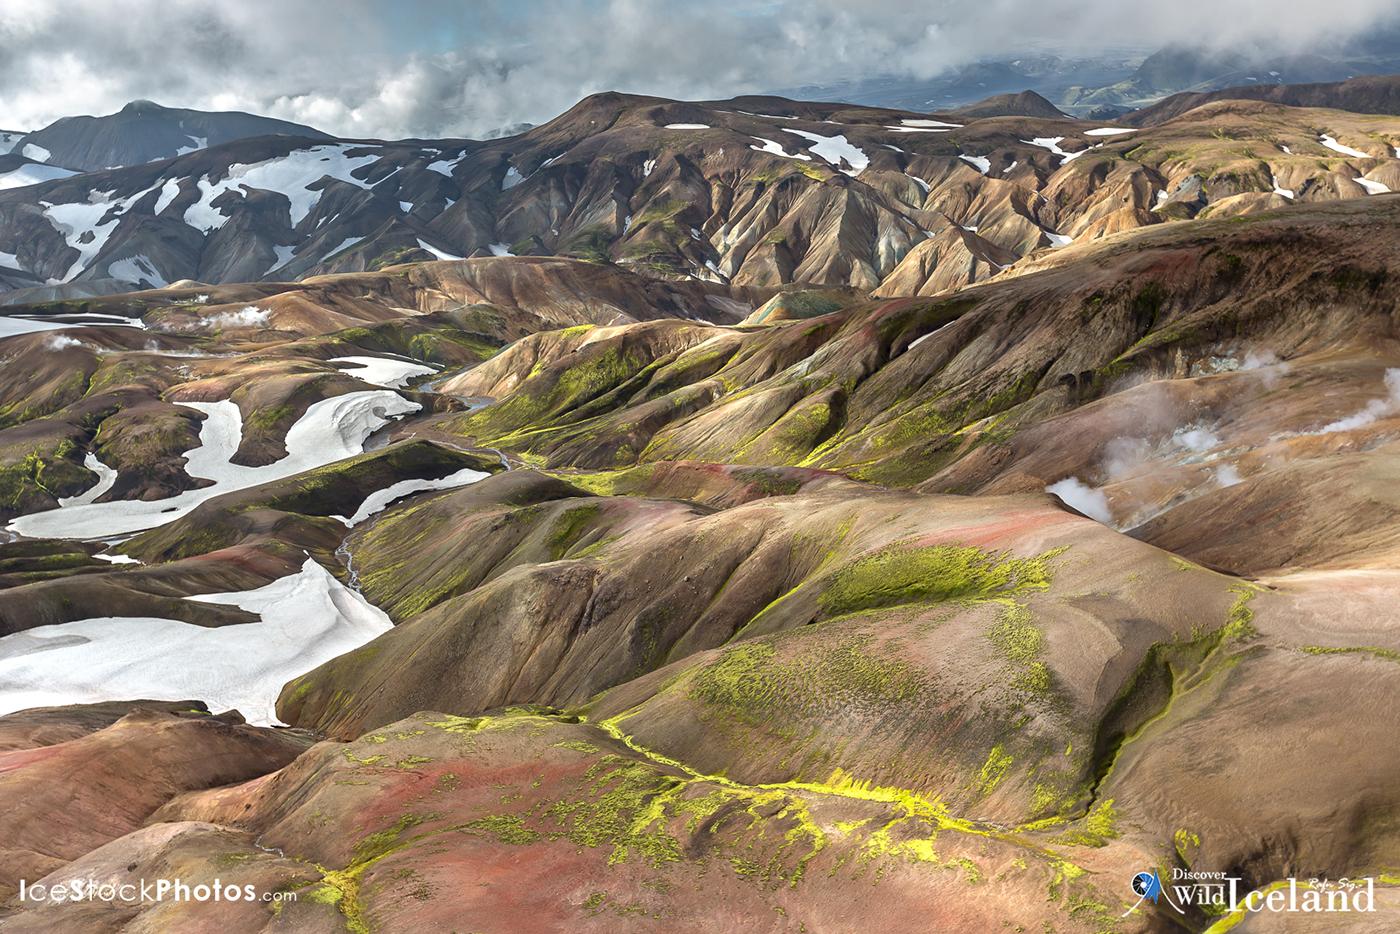 Discover Wild Iceland - Landscape from Hrafntinnusker